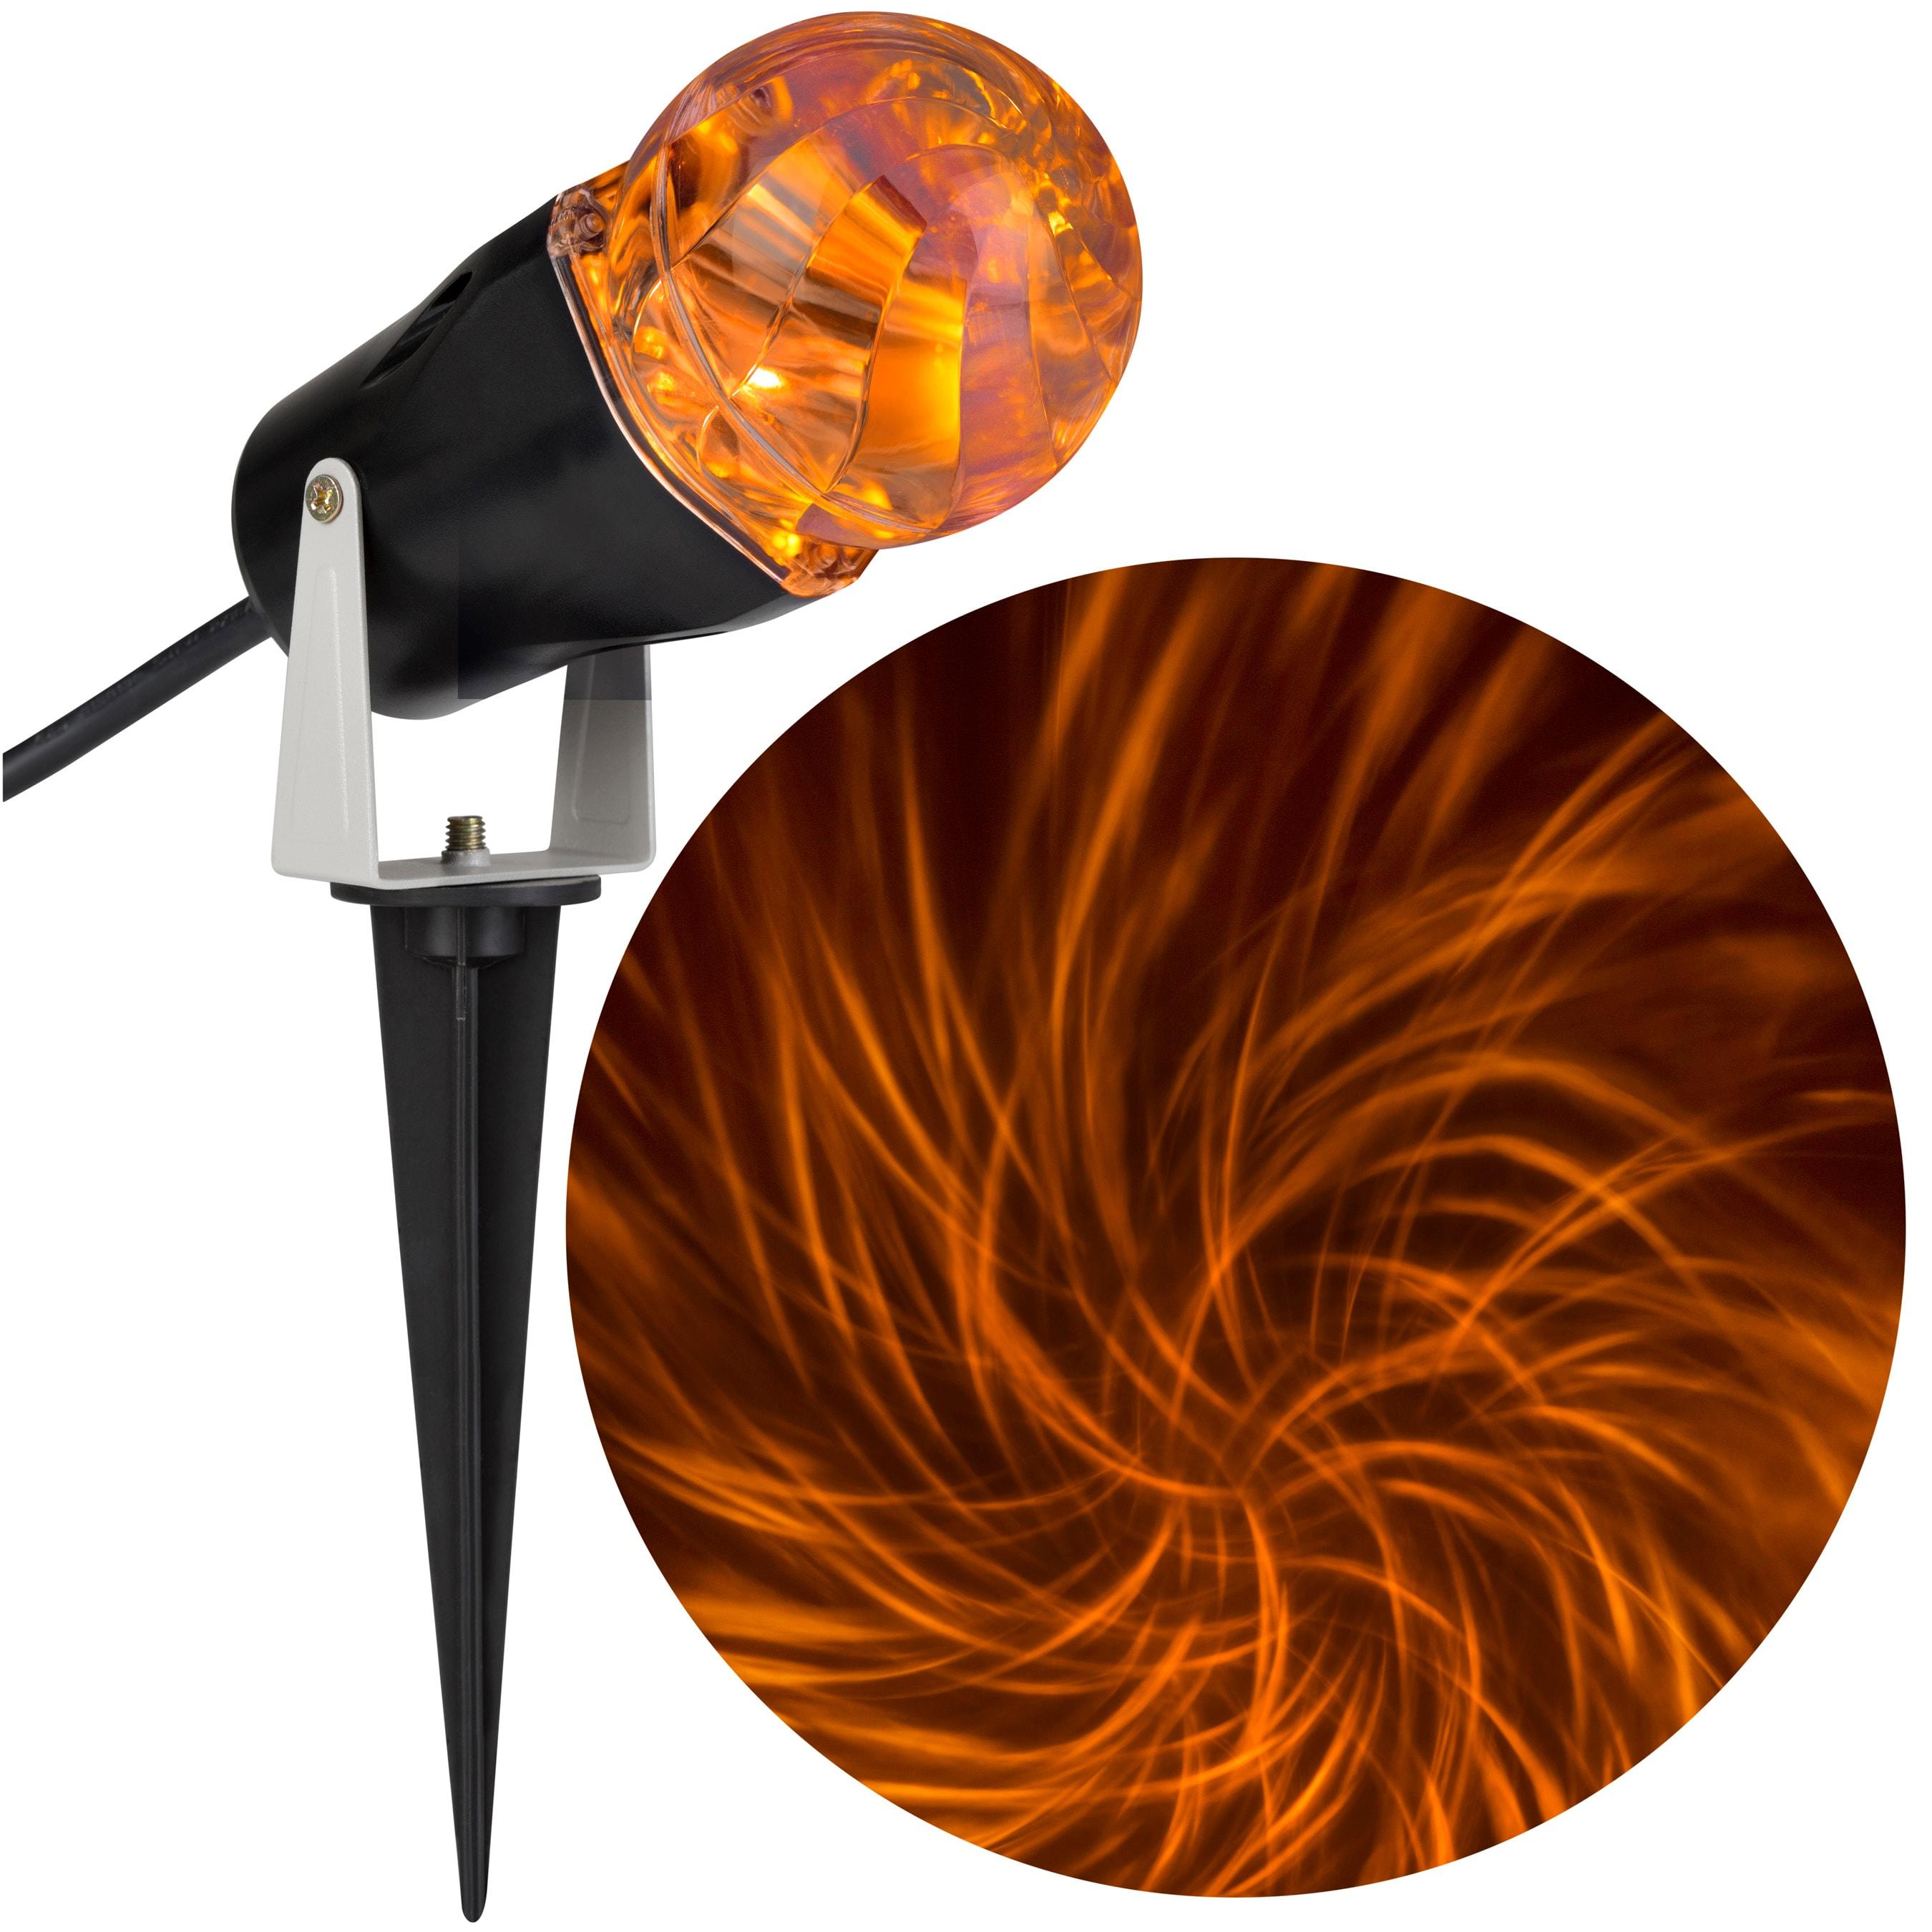 Gemmy Comet Spiral Multi-Function Orange Led Multi-Design Halloween Outdoor Stake Light Projector